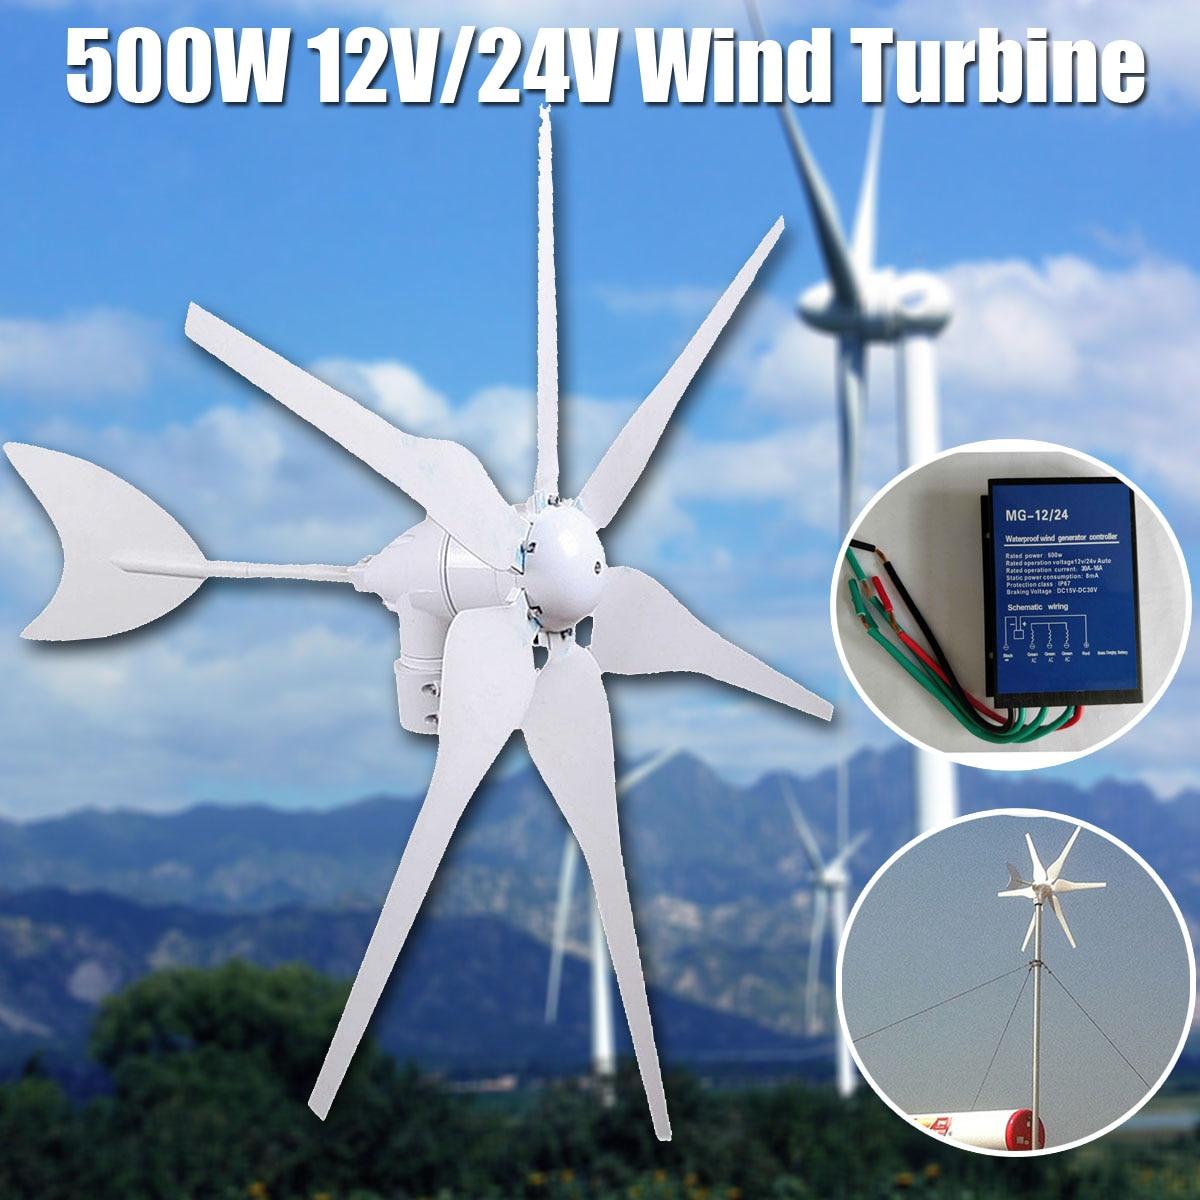 500 W 12 V/24 V Medio ambiente 6 cuchillas miniatura turbina de viento Mini turbina de viento generador de energía hogar residencial con controlador